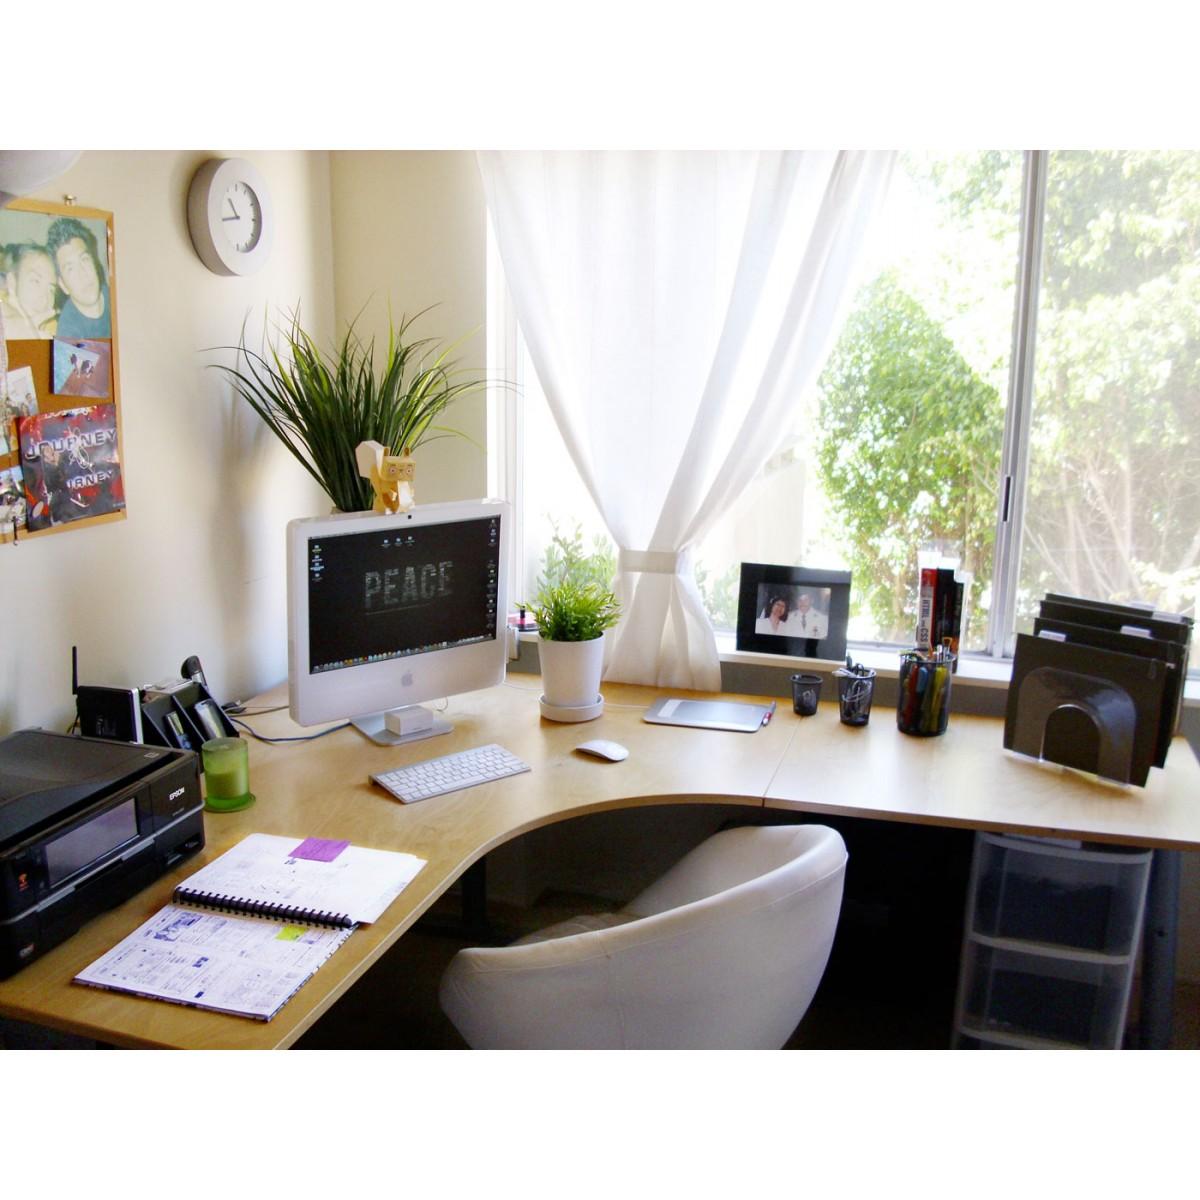 management_%20Secretarial_Office_Management-1200x1200.jpg